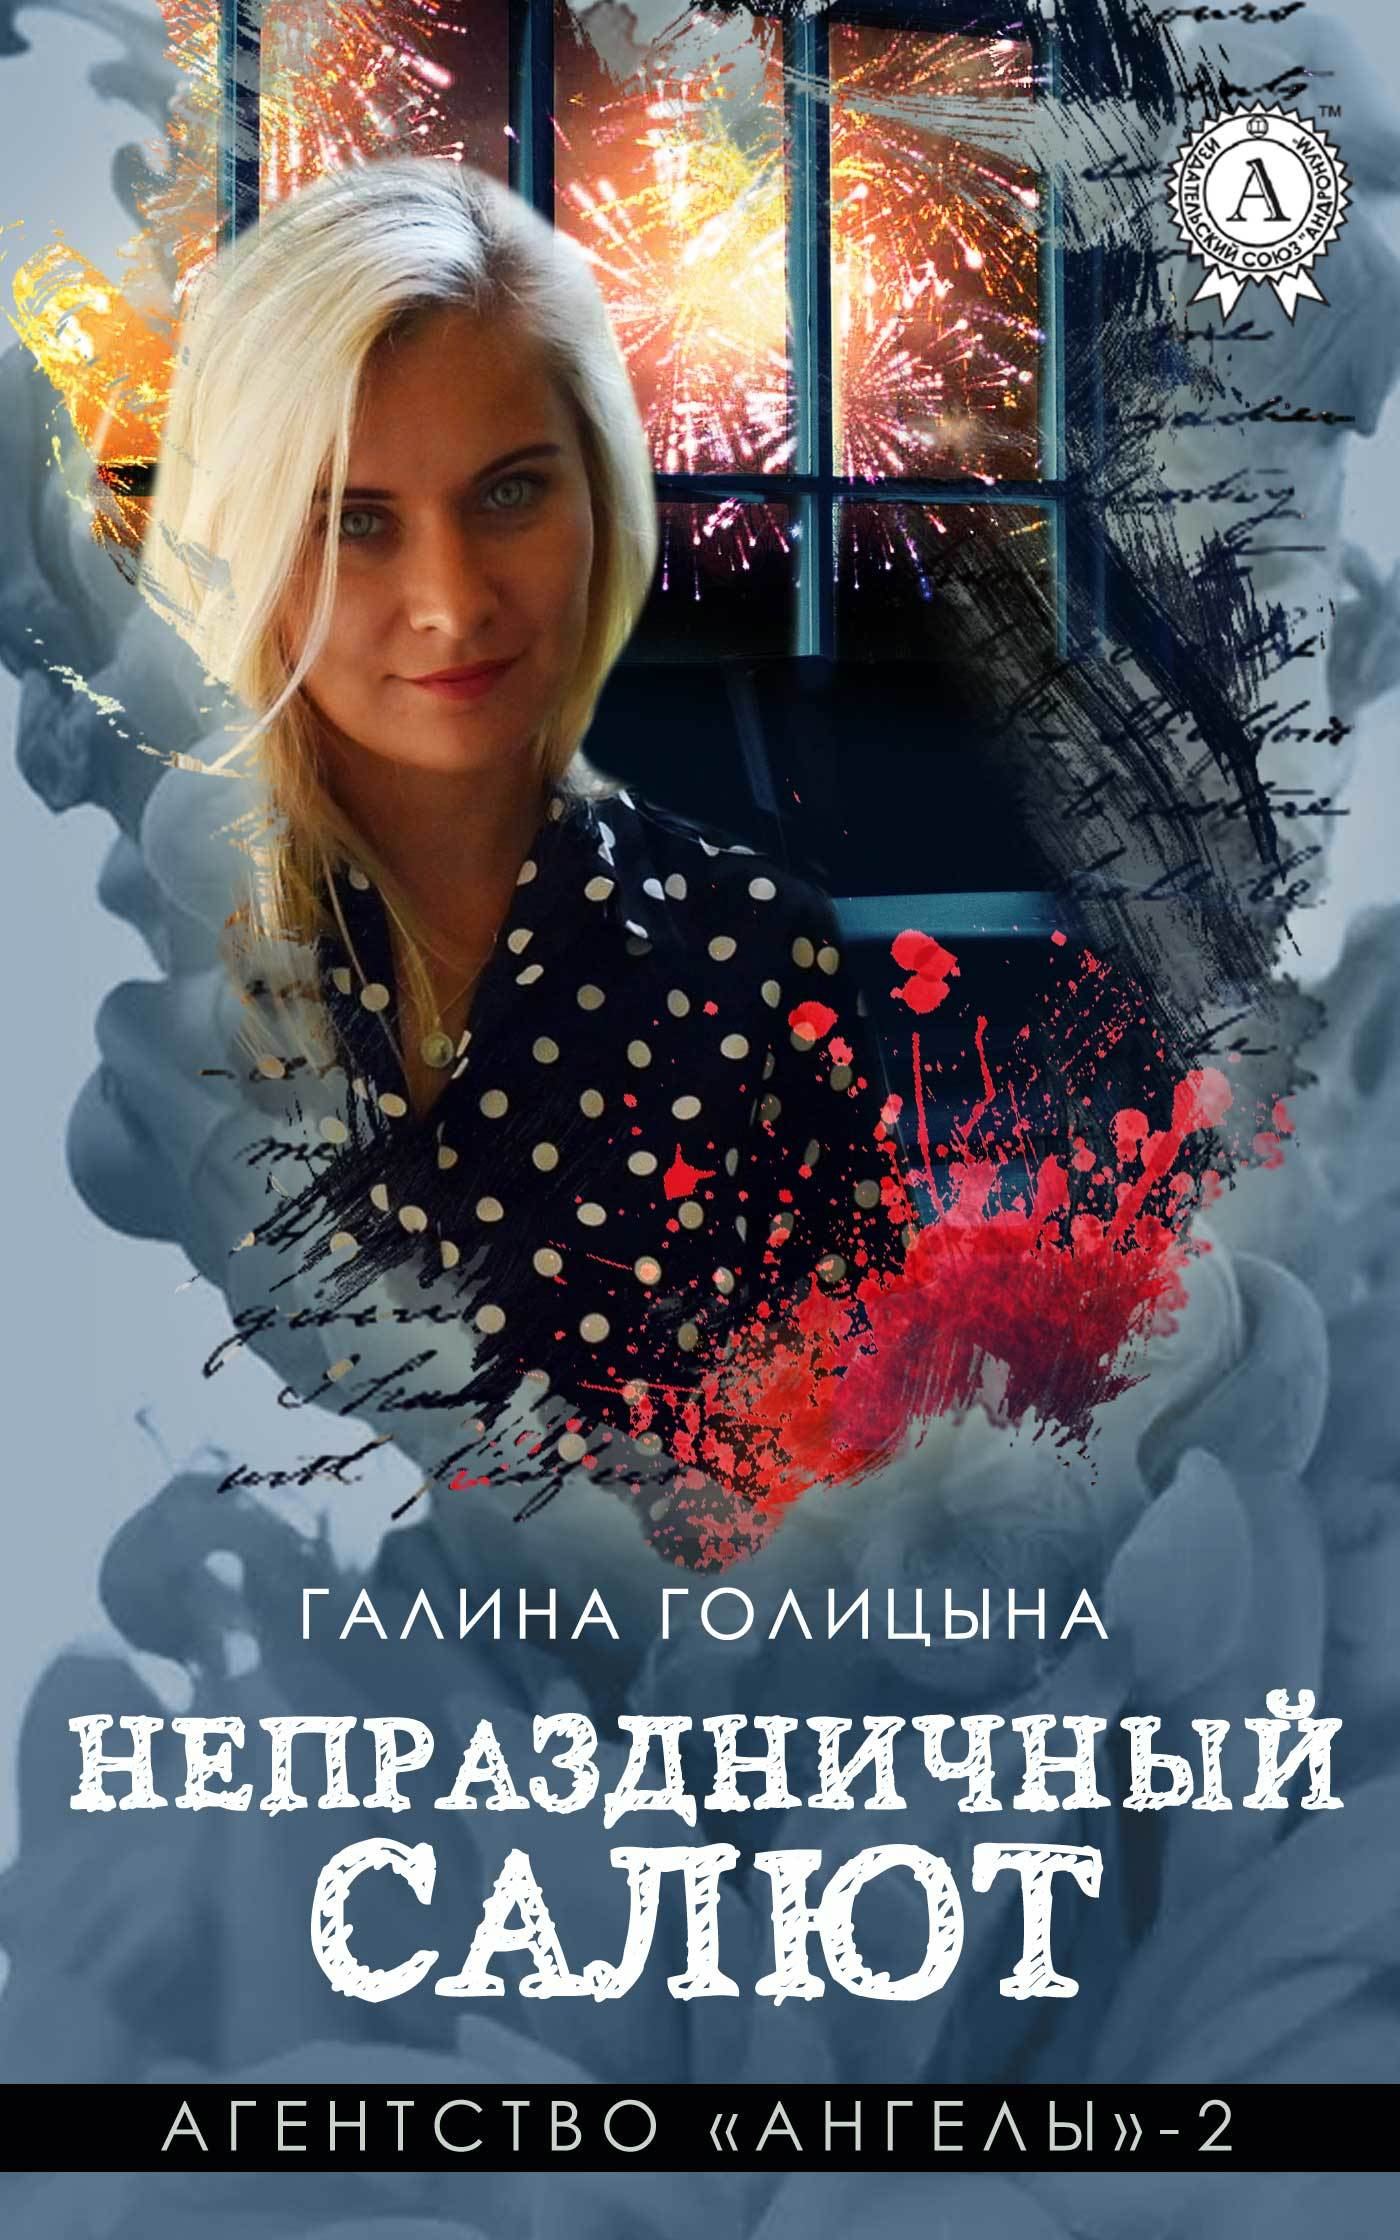 Галина Голицына Непраздничный салют галина голицына бомж миллионер